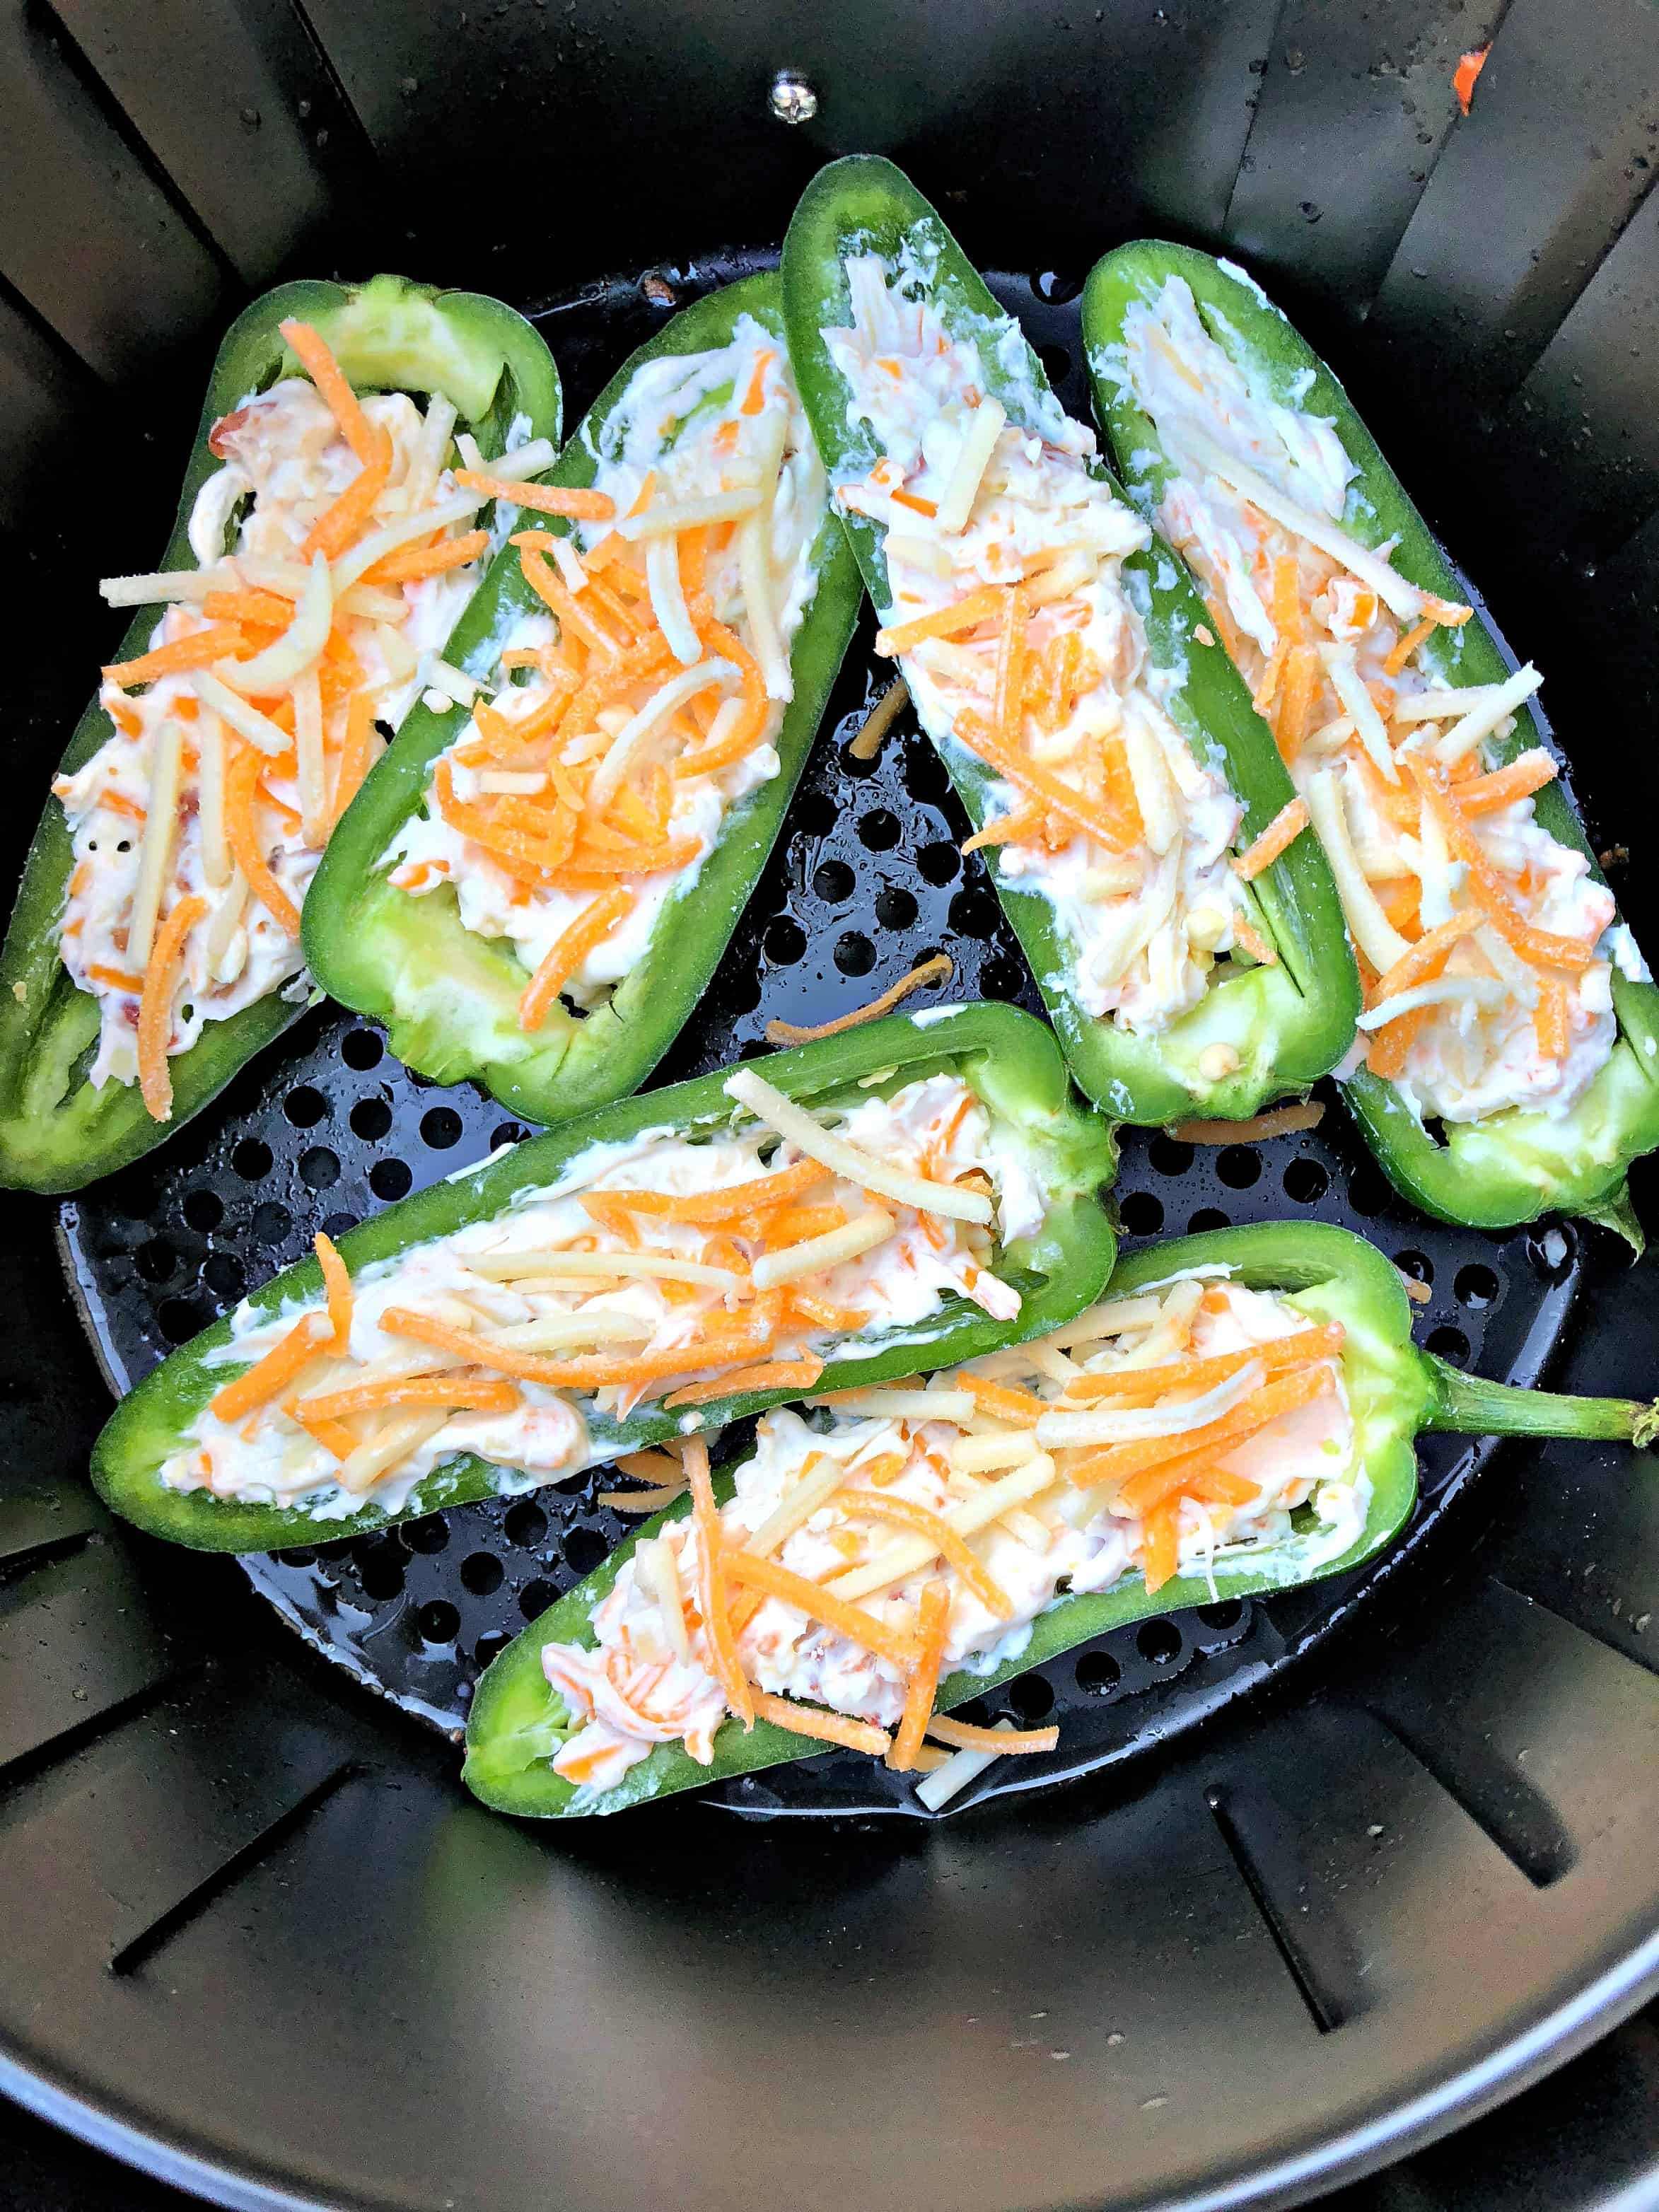 Keto Air Fryer Recipes Dessert